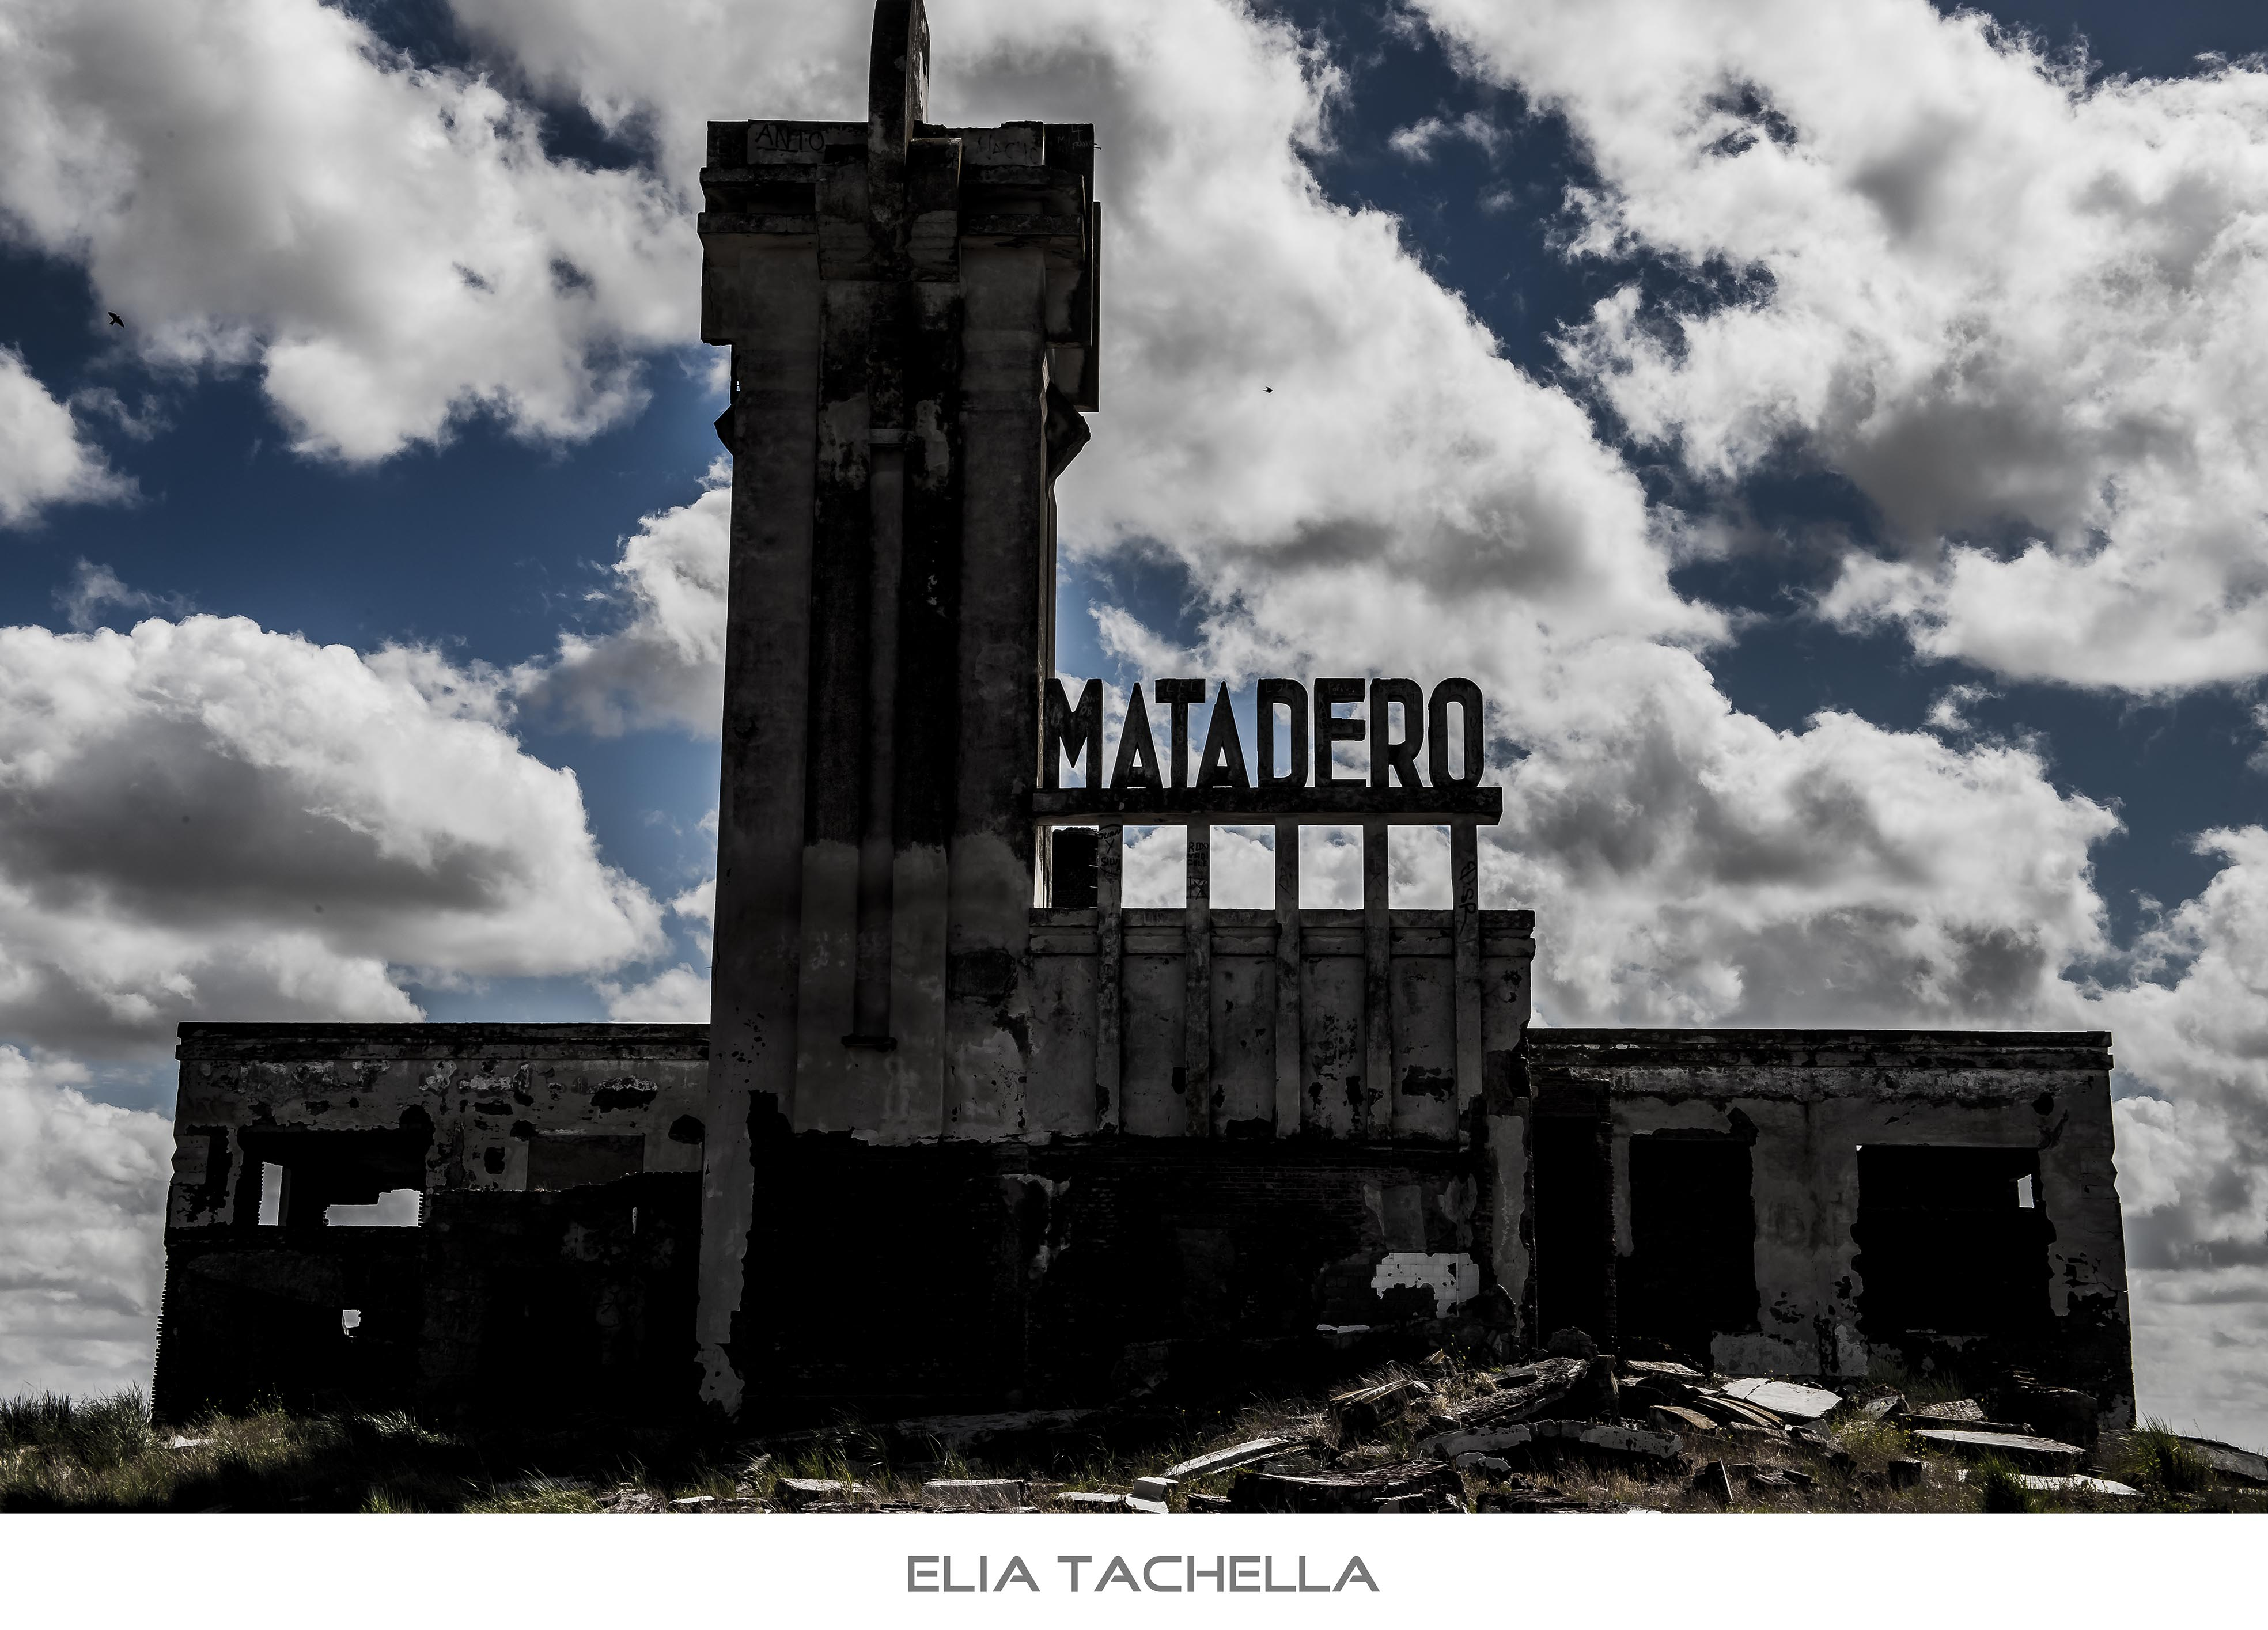 Matadero-EliaTachella-2014.jpg